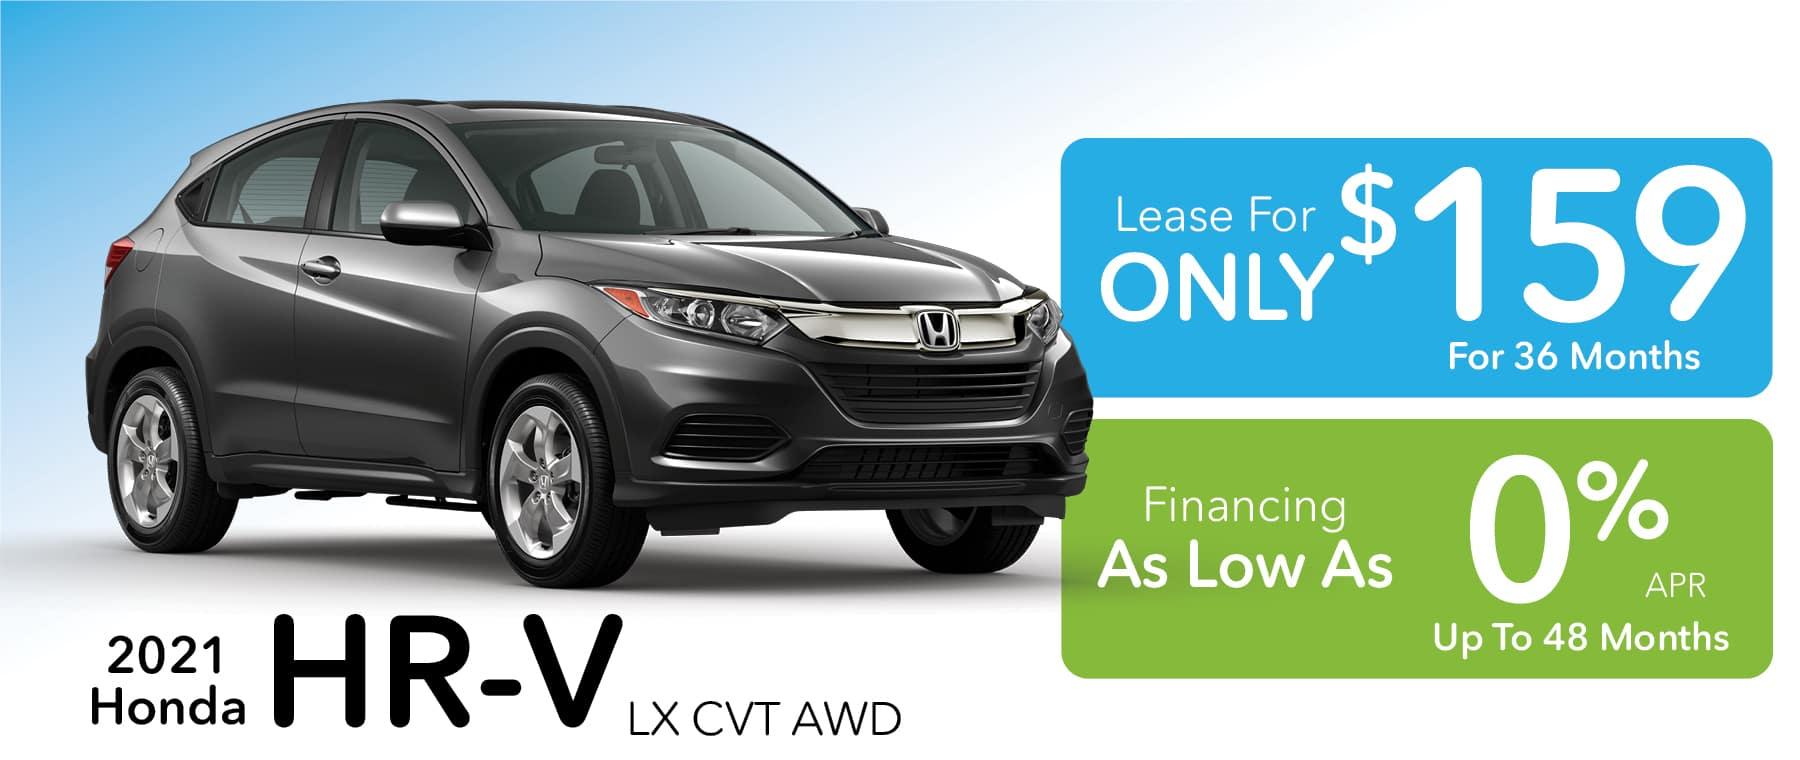 2020 Honda HR-V CVT LX AWD ISUV in Greensburg PA